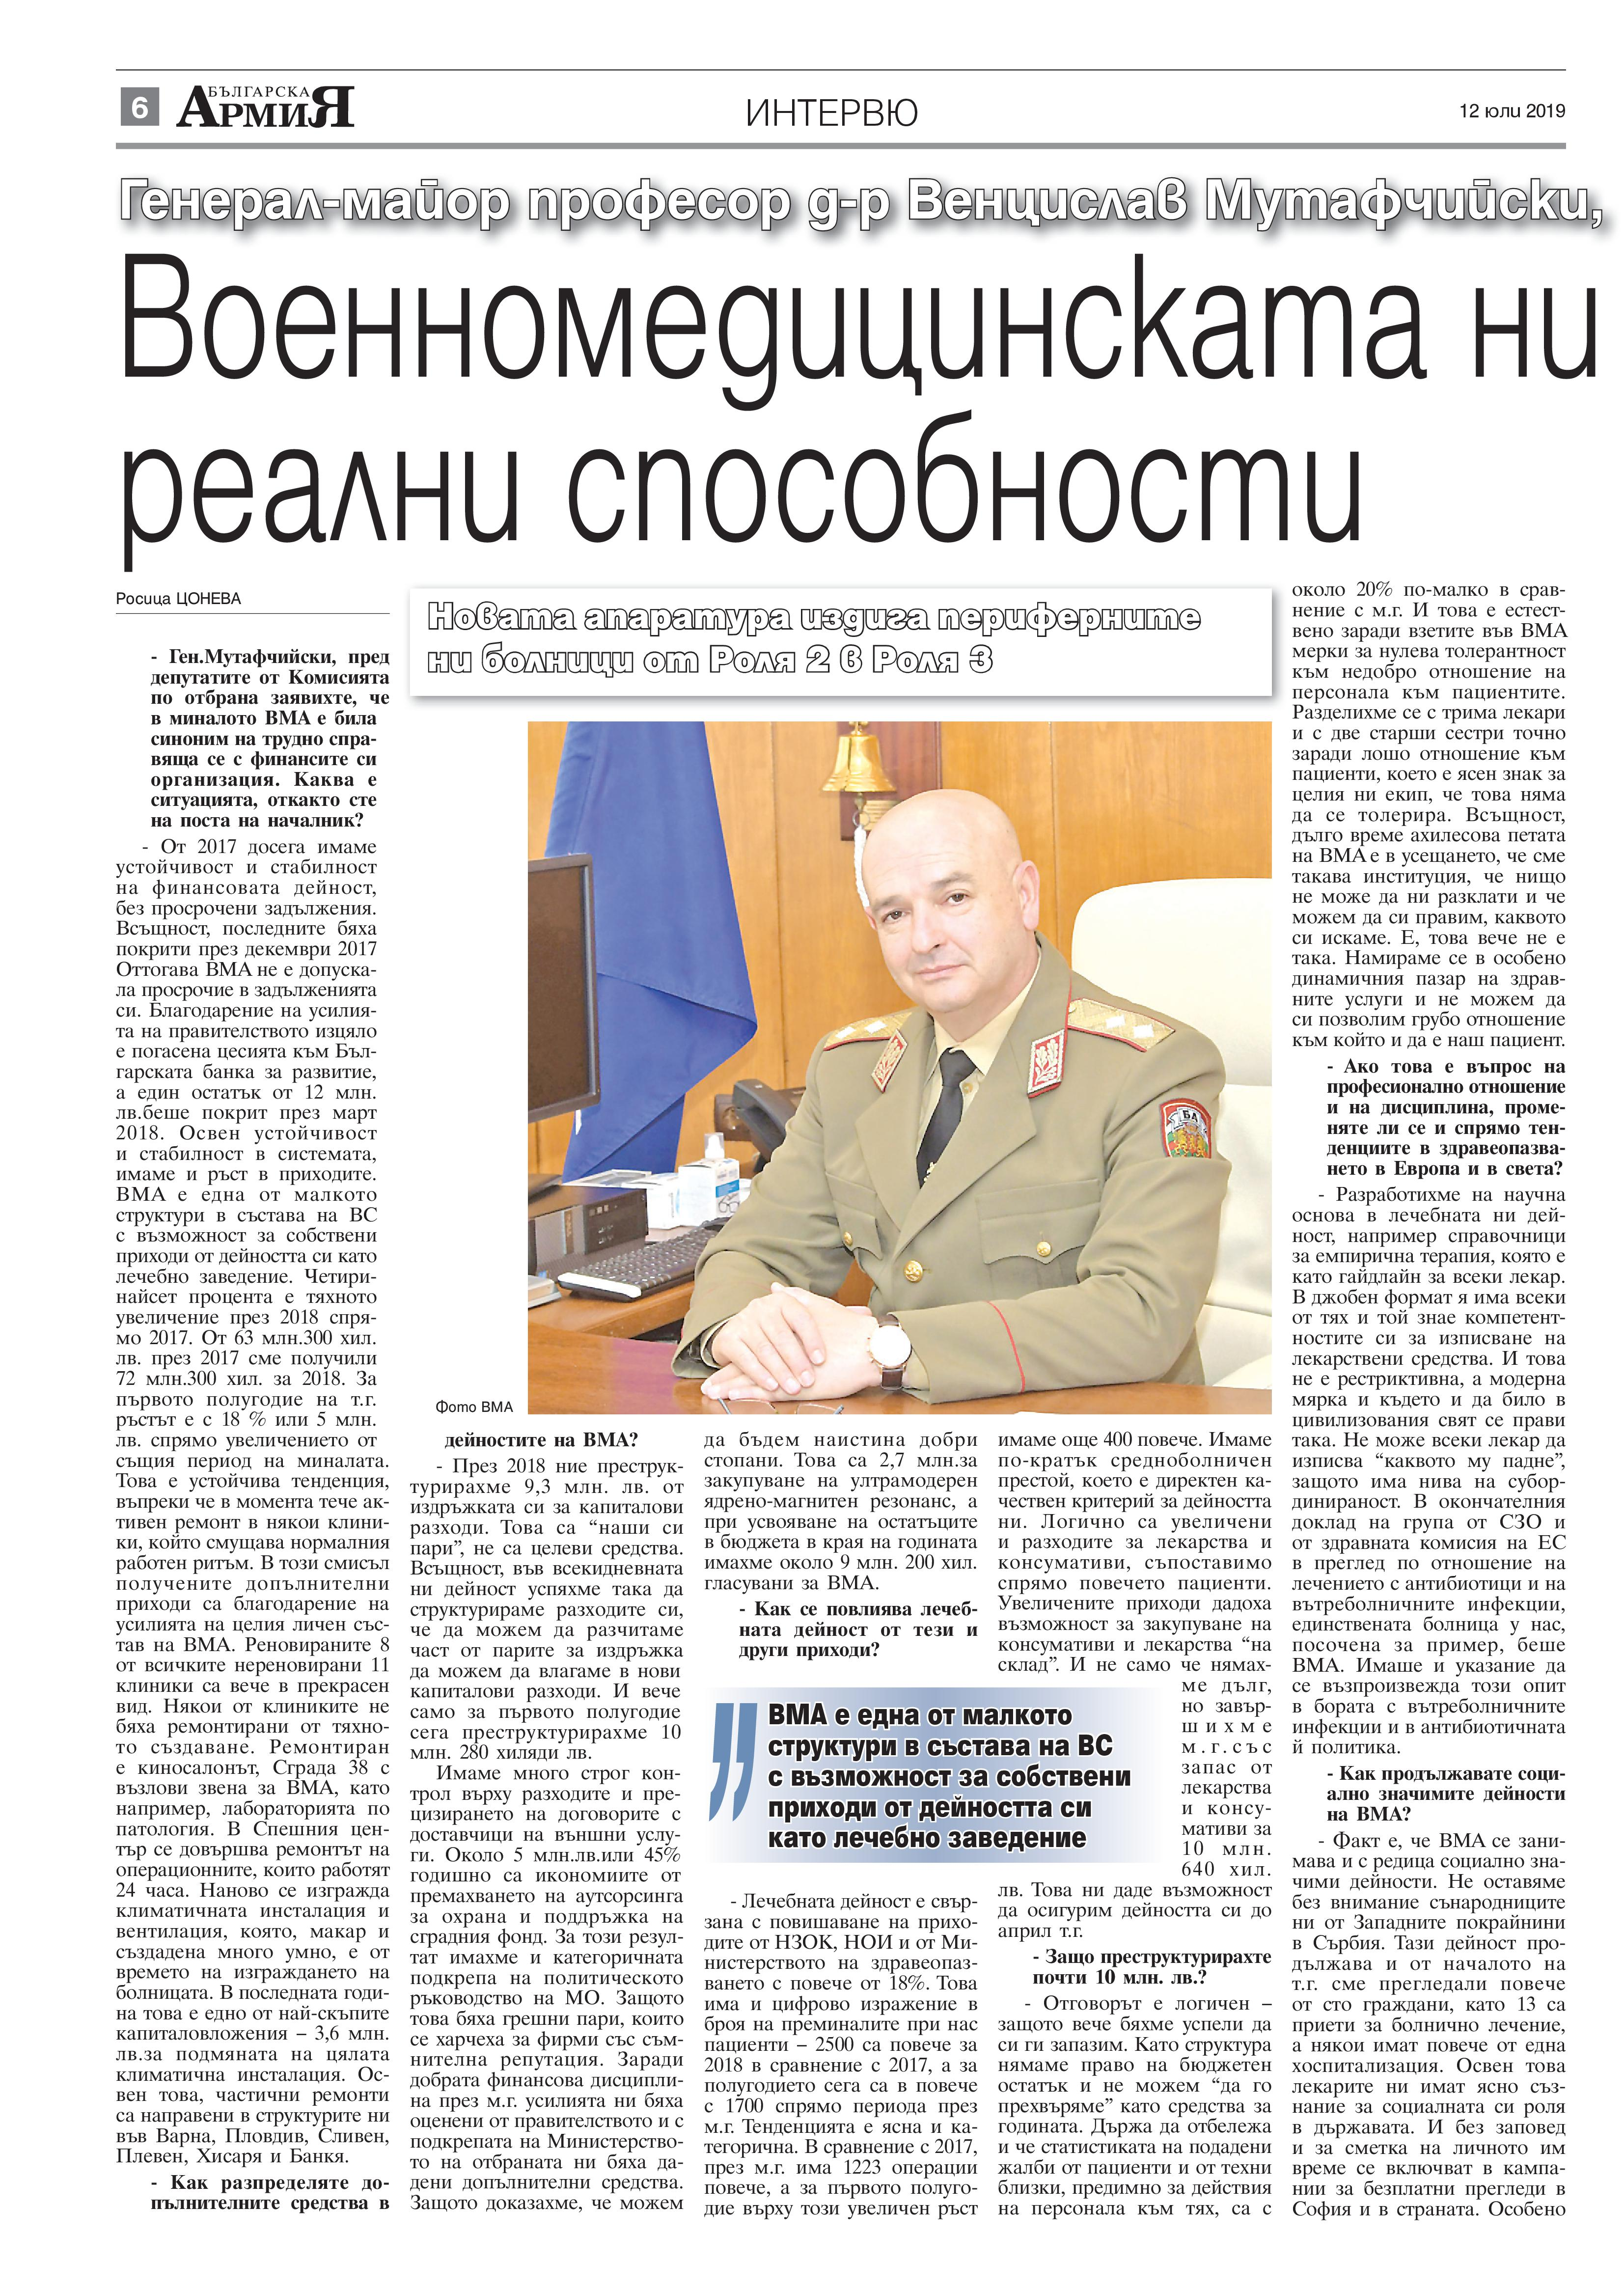 https://armymedia.bg/wp-content/uploads/2015/06/06-28.jpg